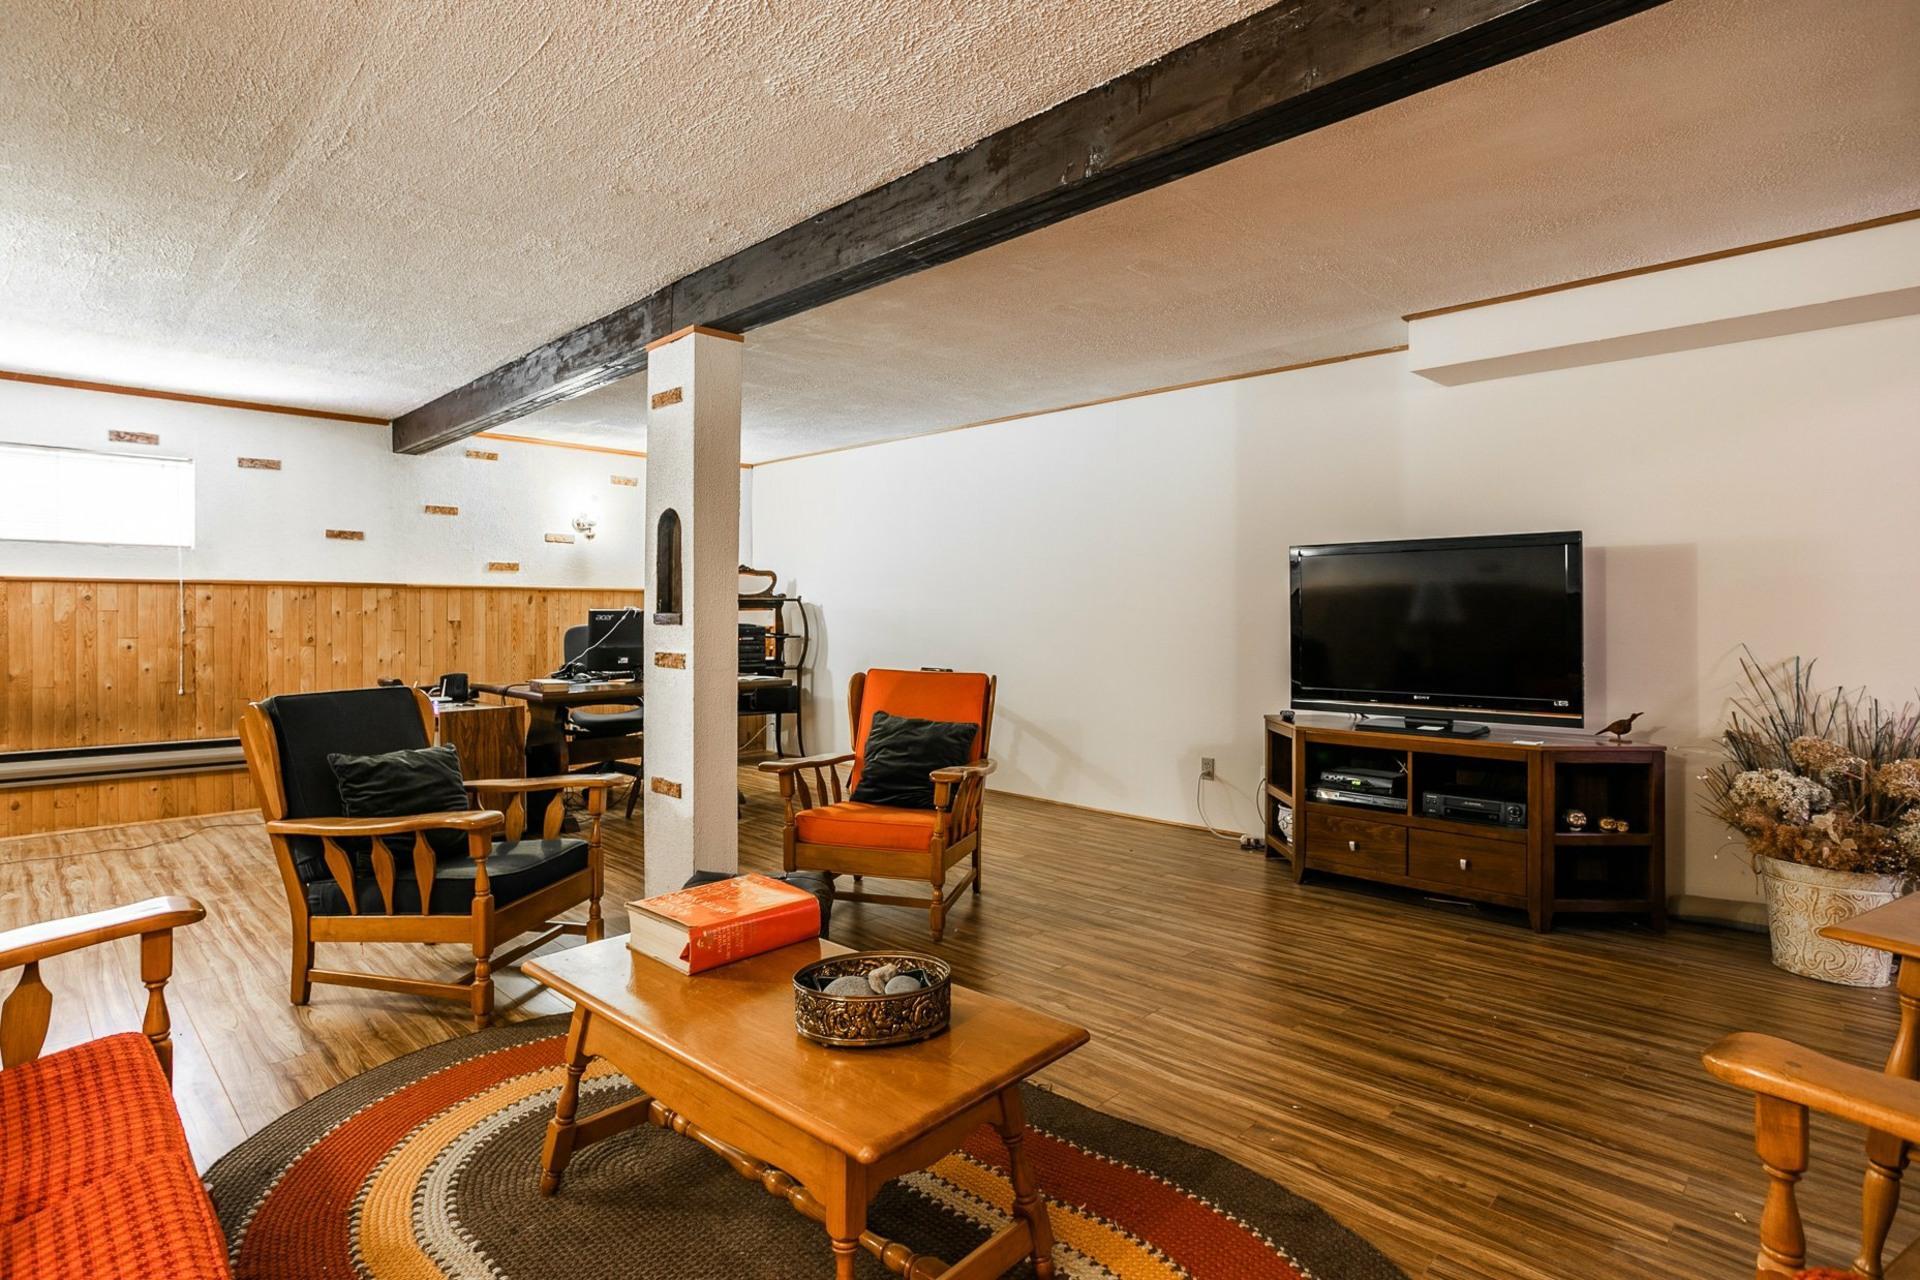 image 16 - House For sale Pierrefonds-Roxboro Montréal  - 8 rooms